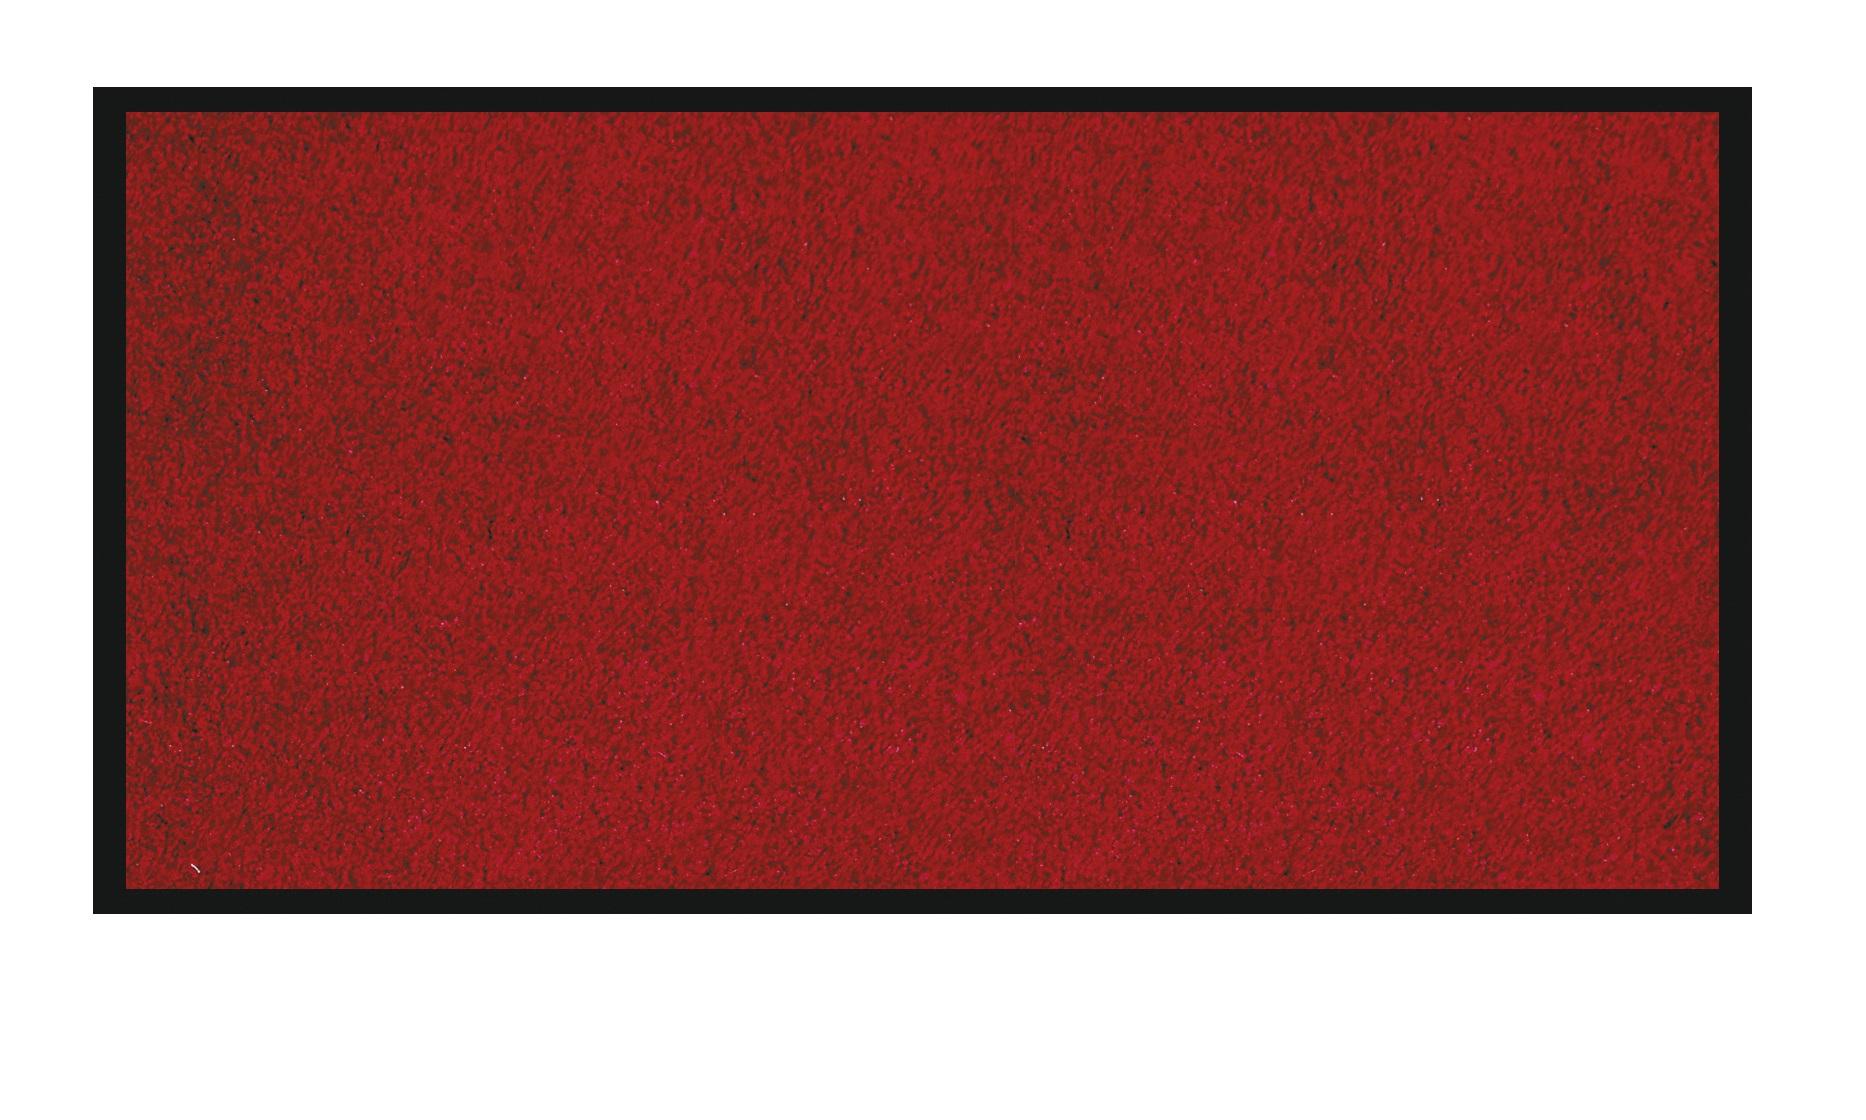 Tapis de sol absorbant RAINBOW - 90 x 150 cm - en polyamide - rouge